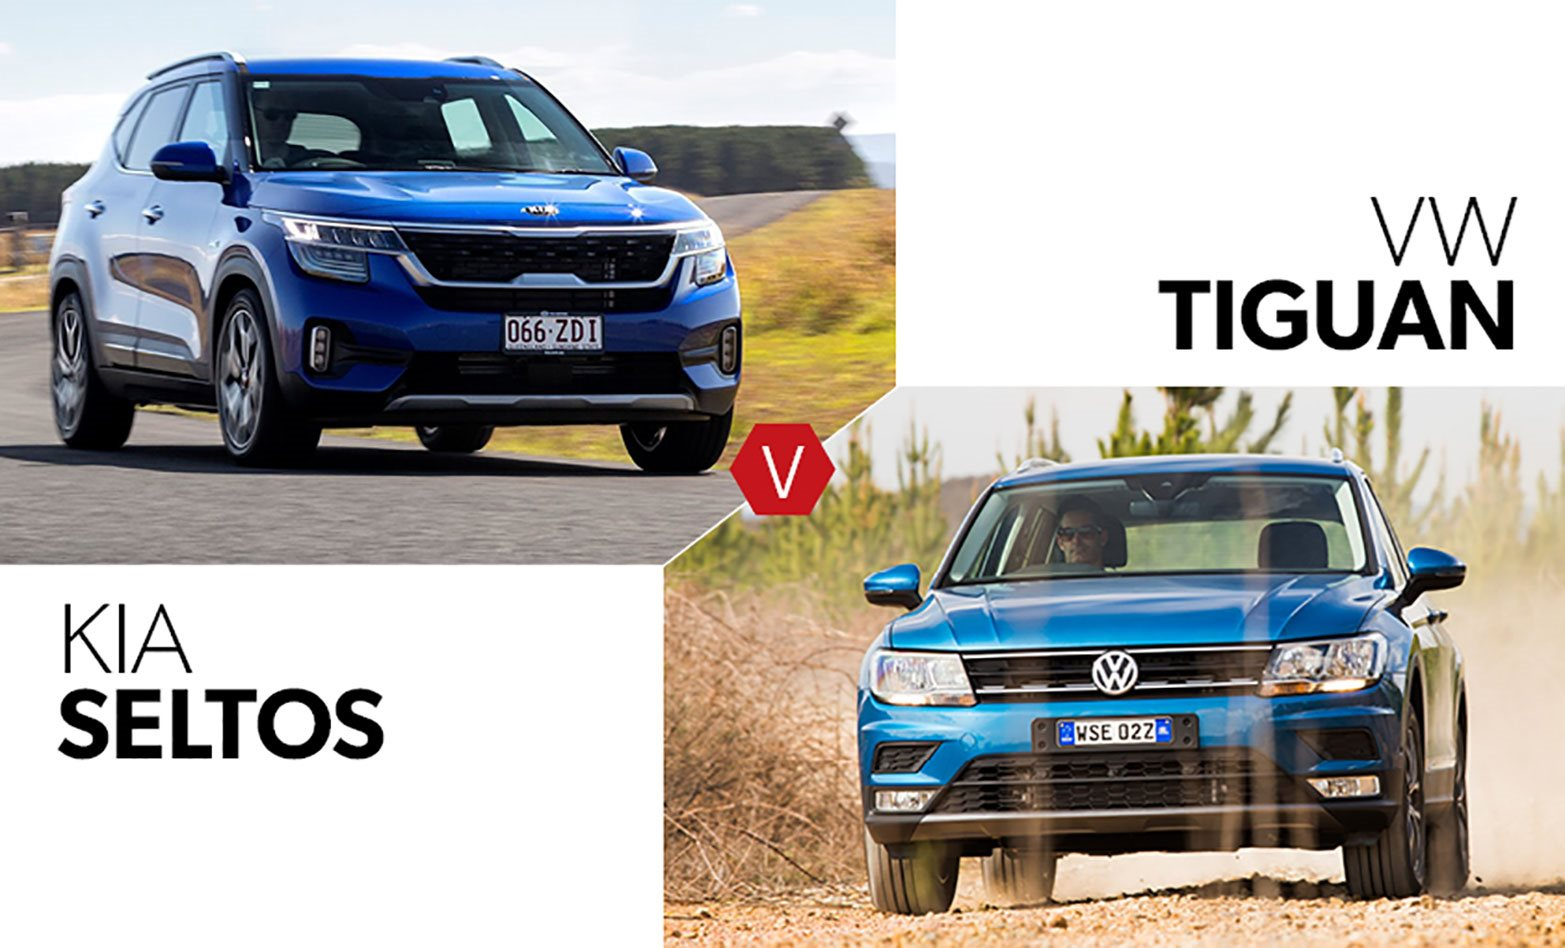 Buy the new Kia Seltos GT-Line or get a used Volkswagen Tiguan 132TSI Comfortline